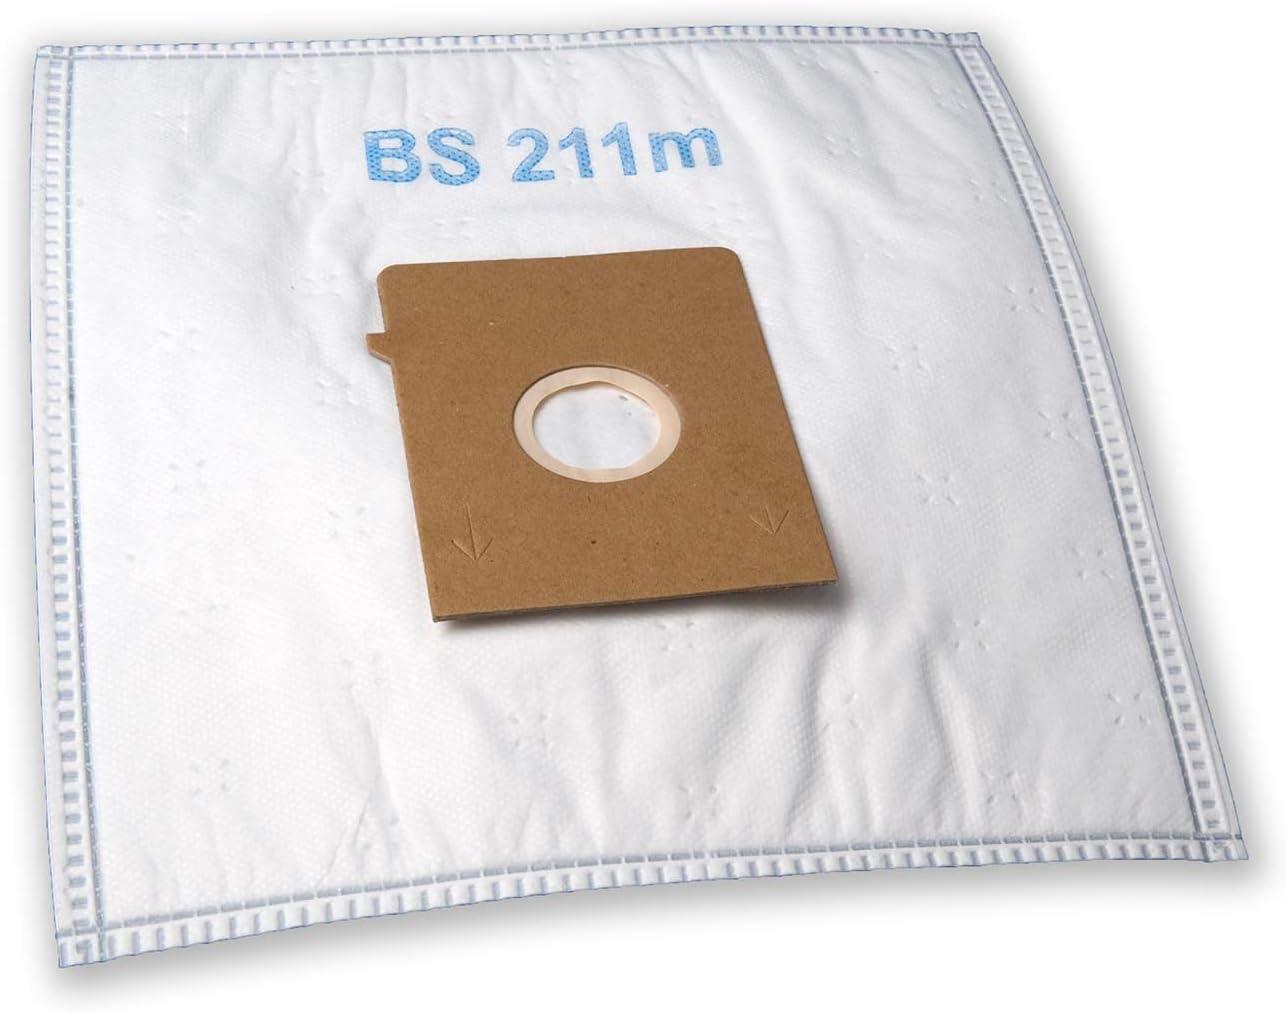 eVendix Bolsa de aspiradora Adecuada para Siemens VS 01E - - Big Bag 3 l | 10 Bolsas de Polvo + 2 microfiltros | Similar a Las Bolsas Originales: VZ 71 AF K, Tipo K.: Amazon.es: Hogar